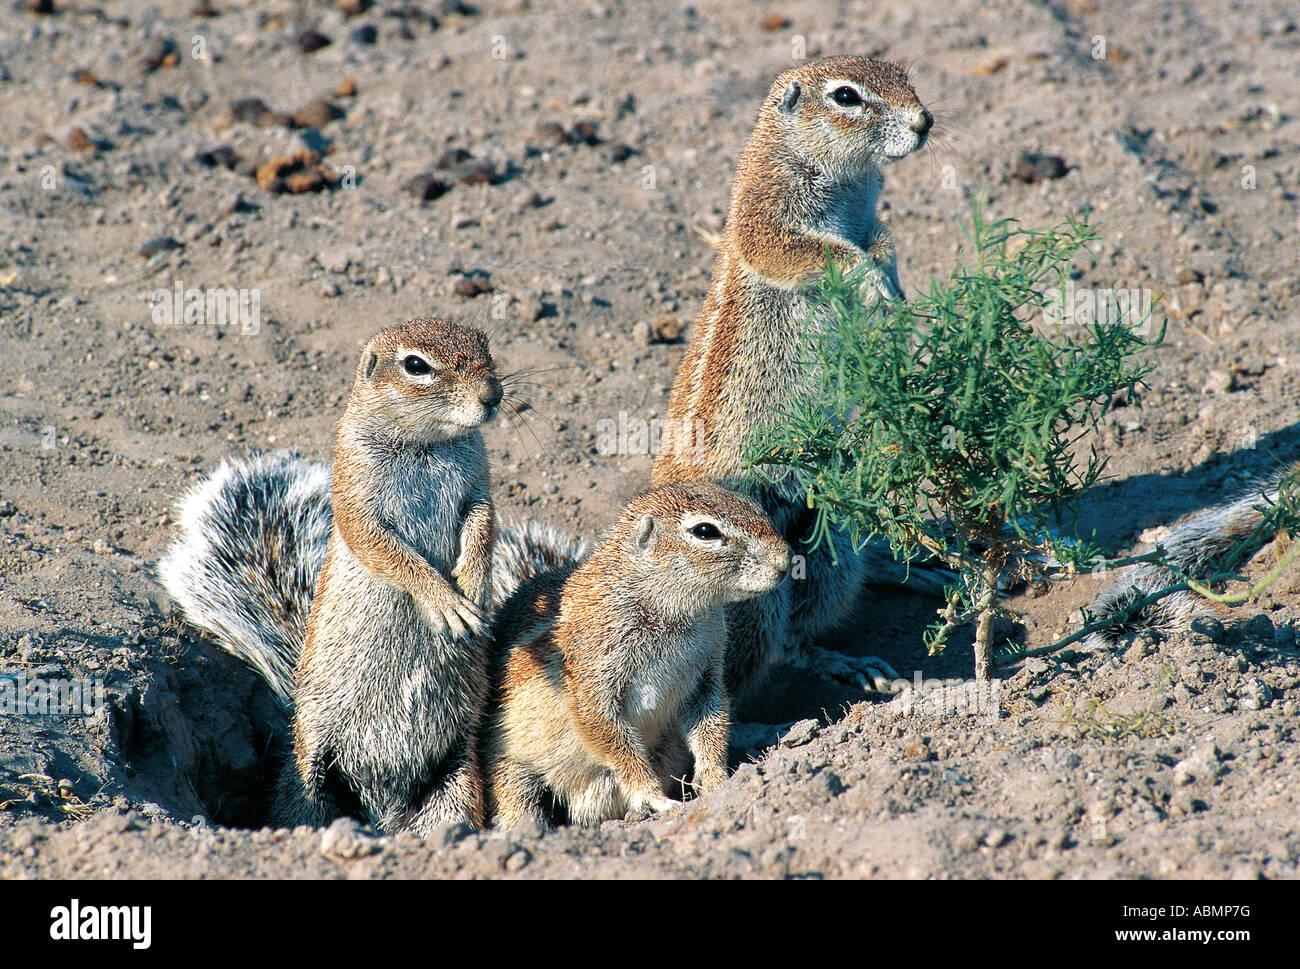 Family group of three Striped Ground Squirrels Central Kalahari Game Reserve Botswana - Stock Image